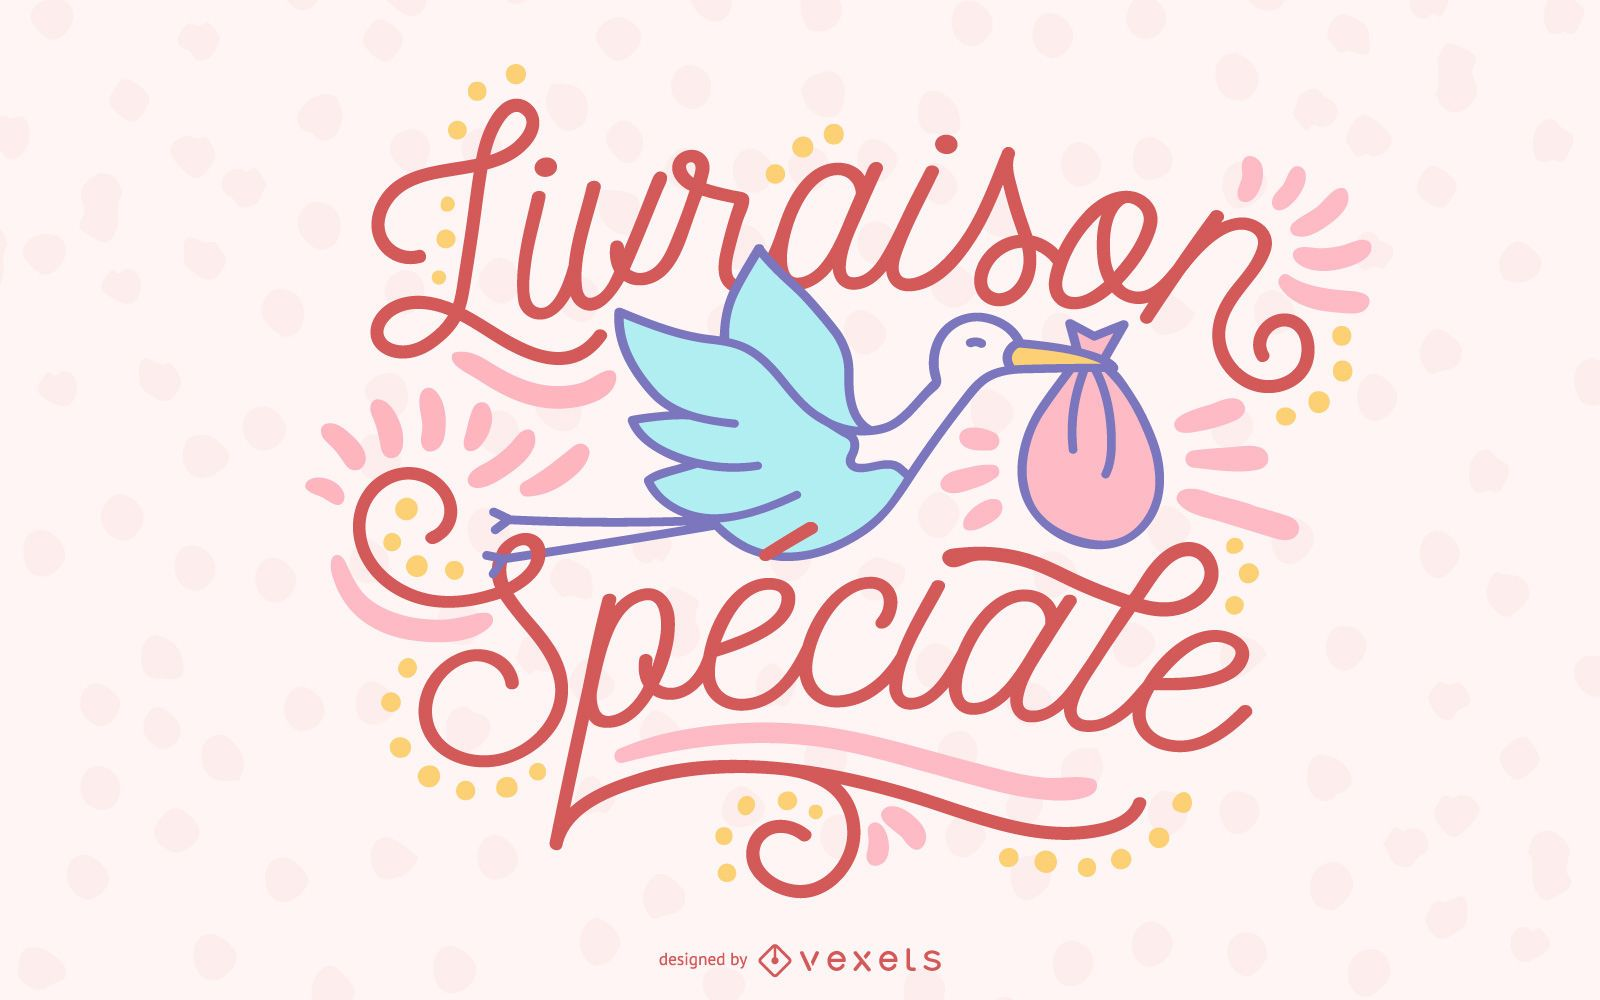 Special Delivery Lettering Design